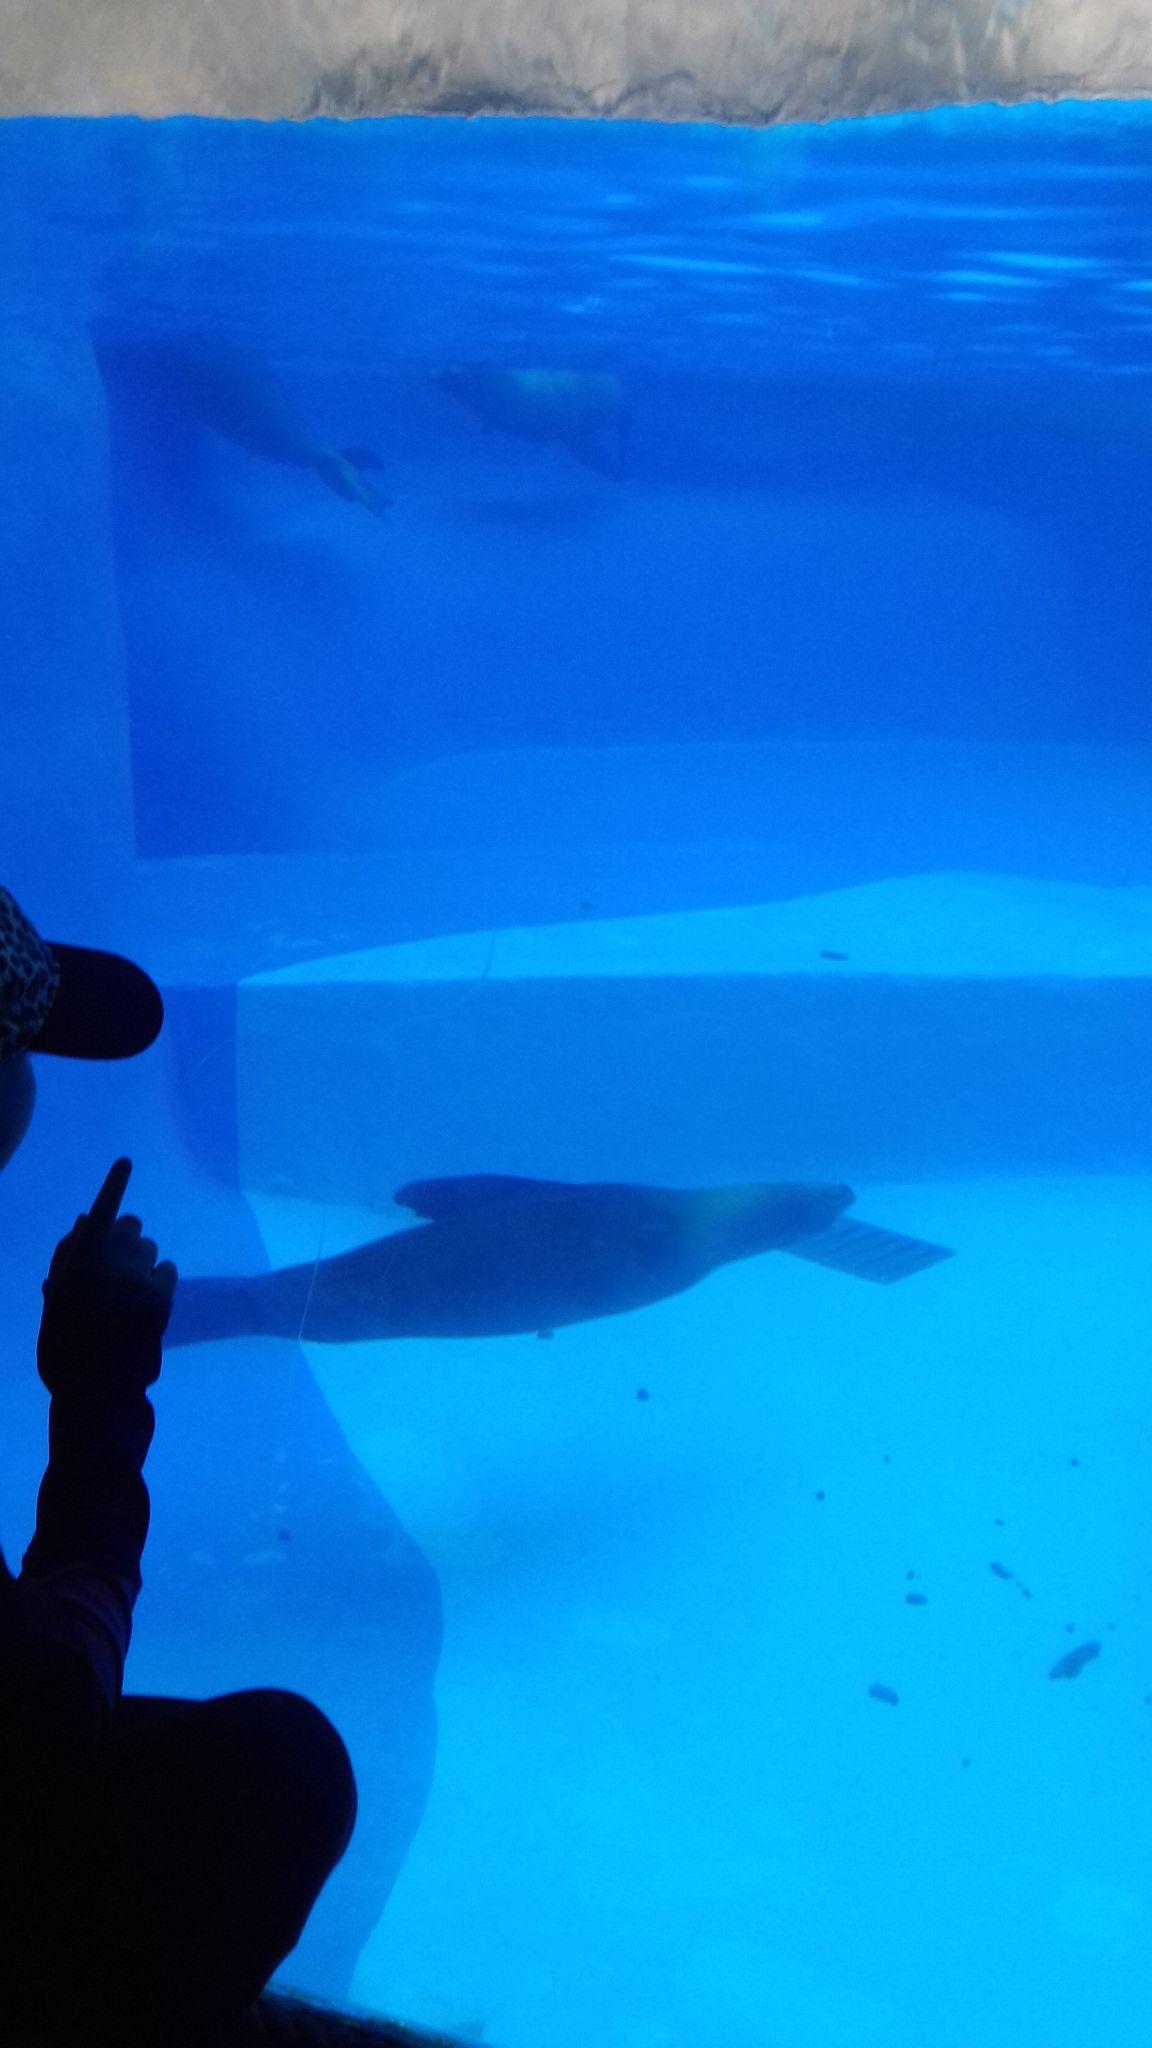 fish tank in 2020 Big fish tanks, Fish tank, Big fish